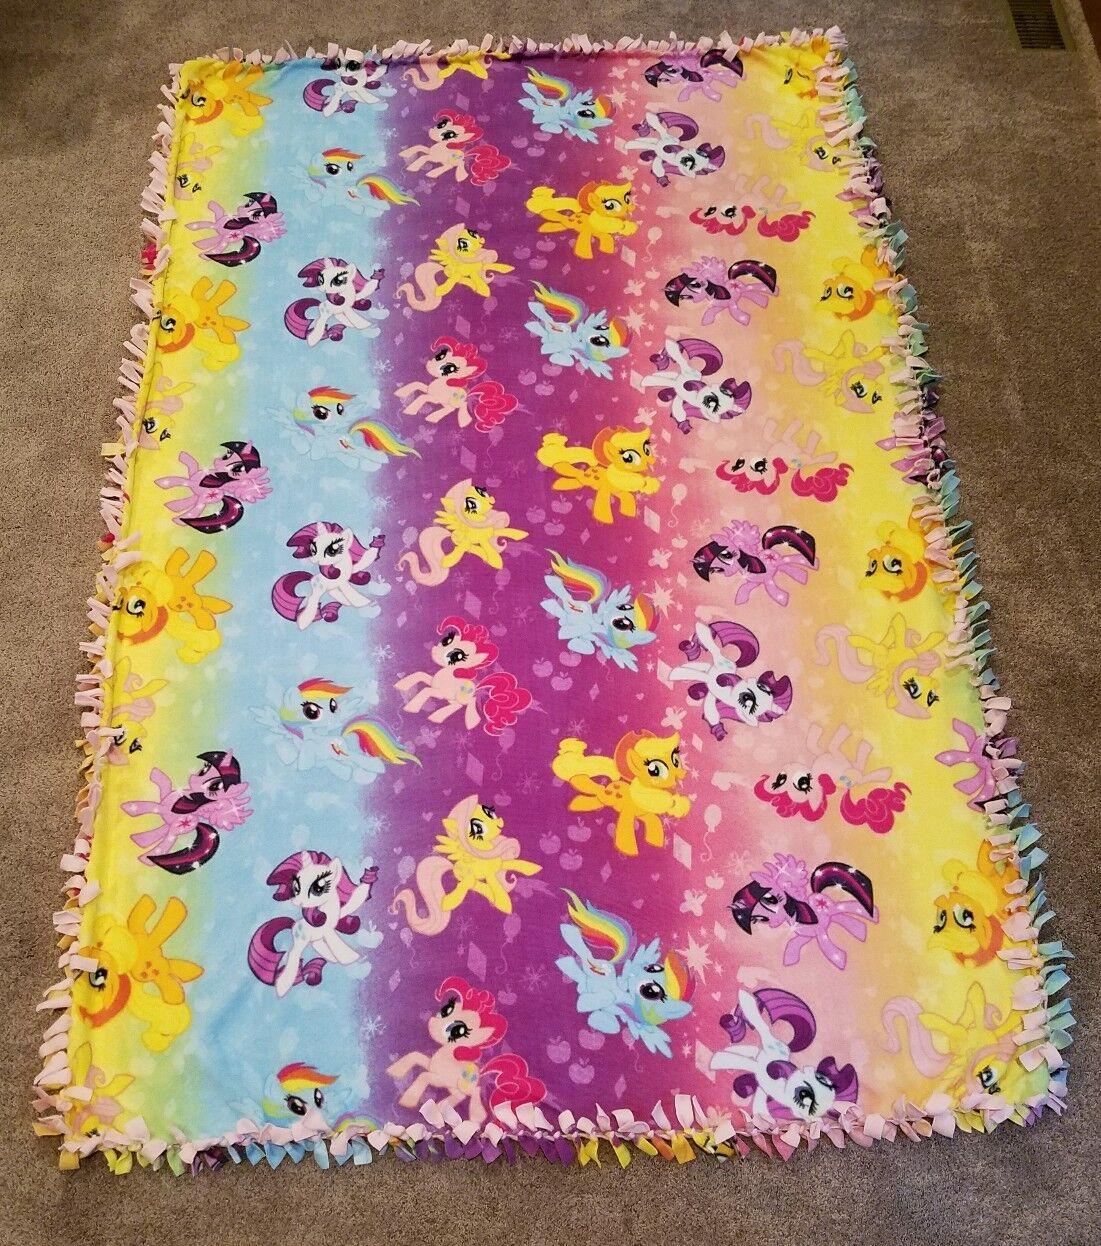 NEW My Little Pony Fleece Tie Blanket 81  L x 52  W pink rainbow ombre handmade